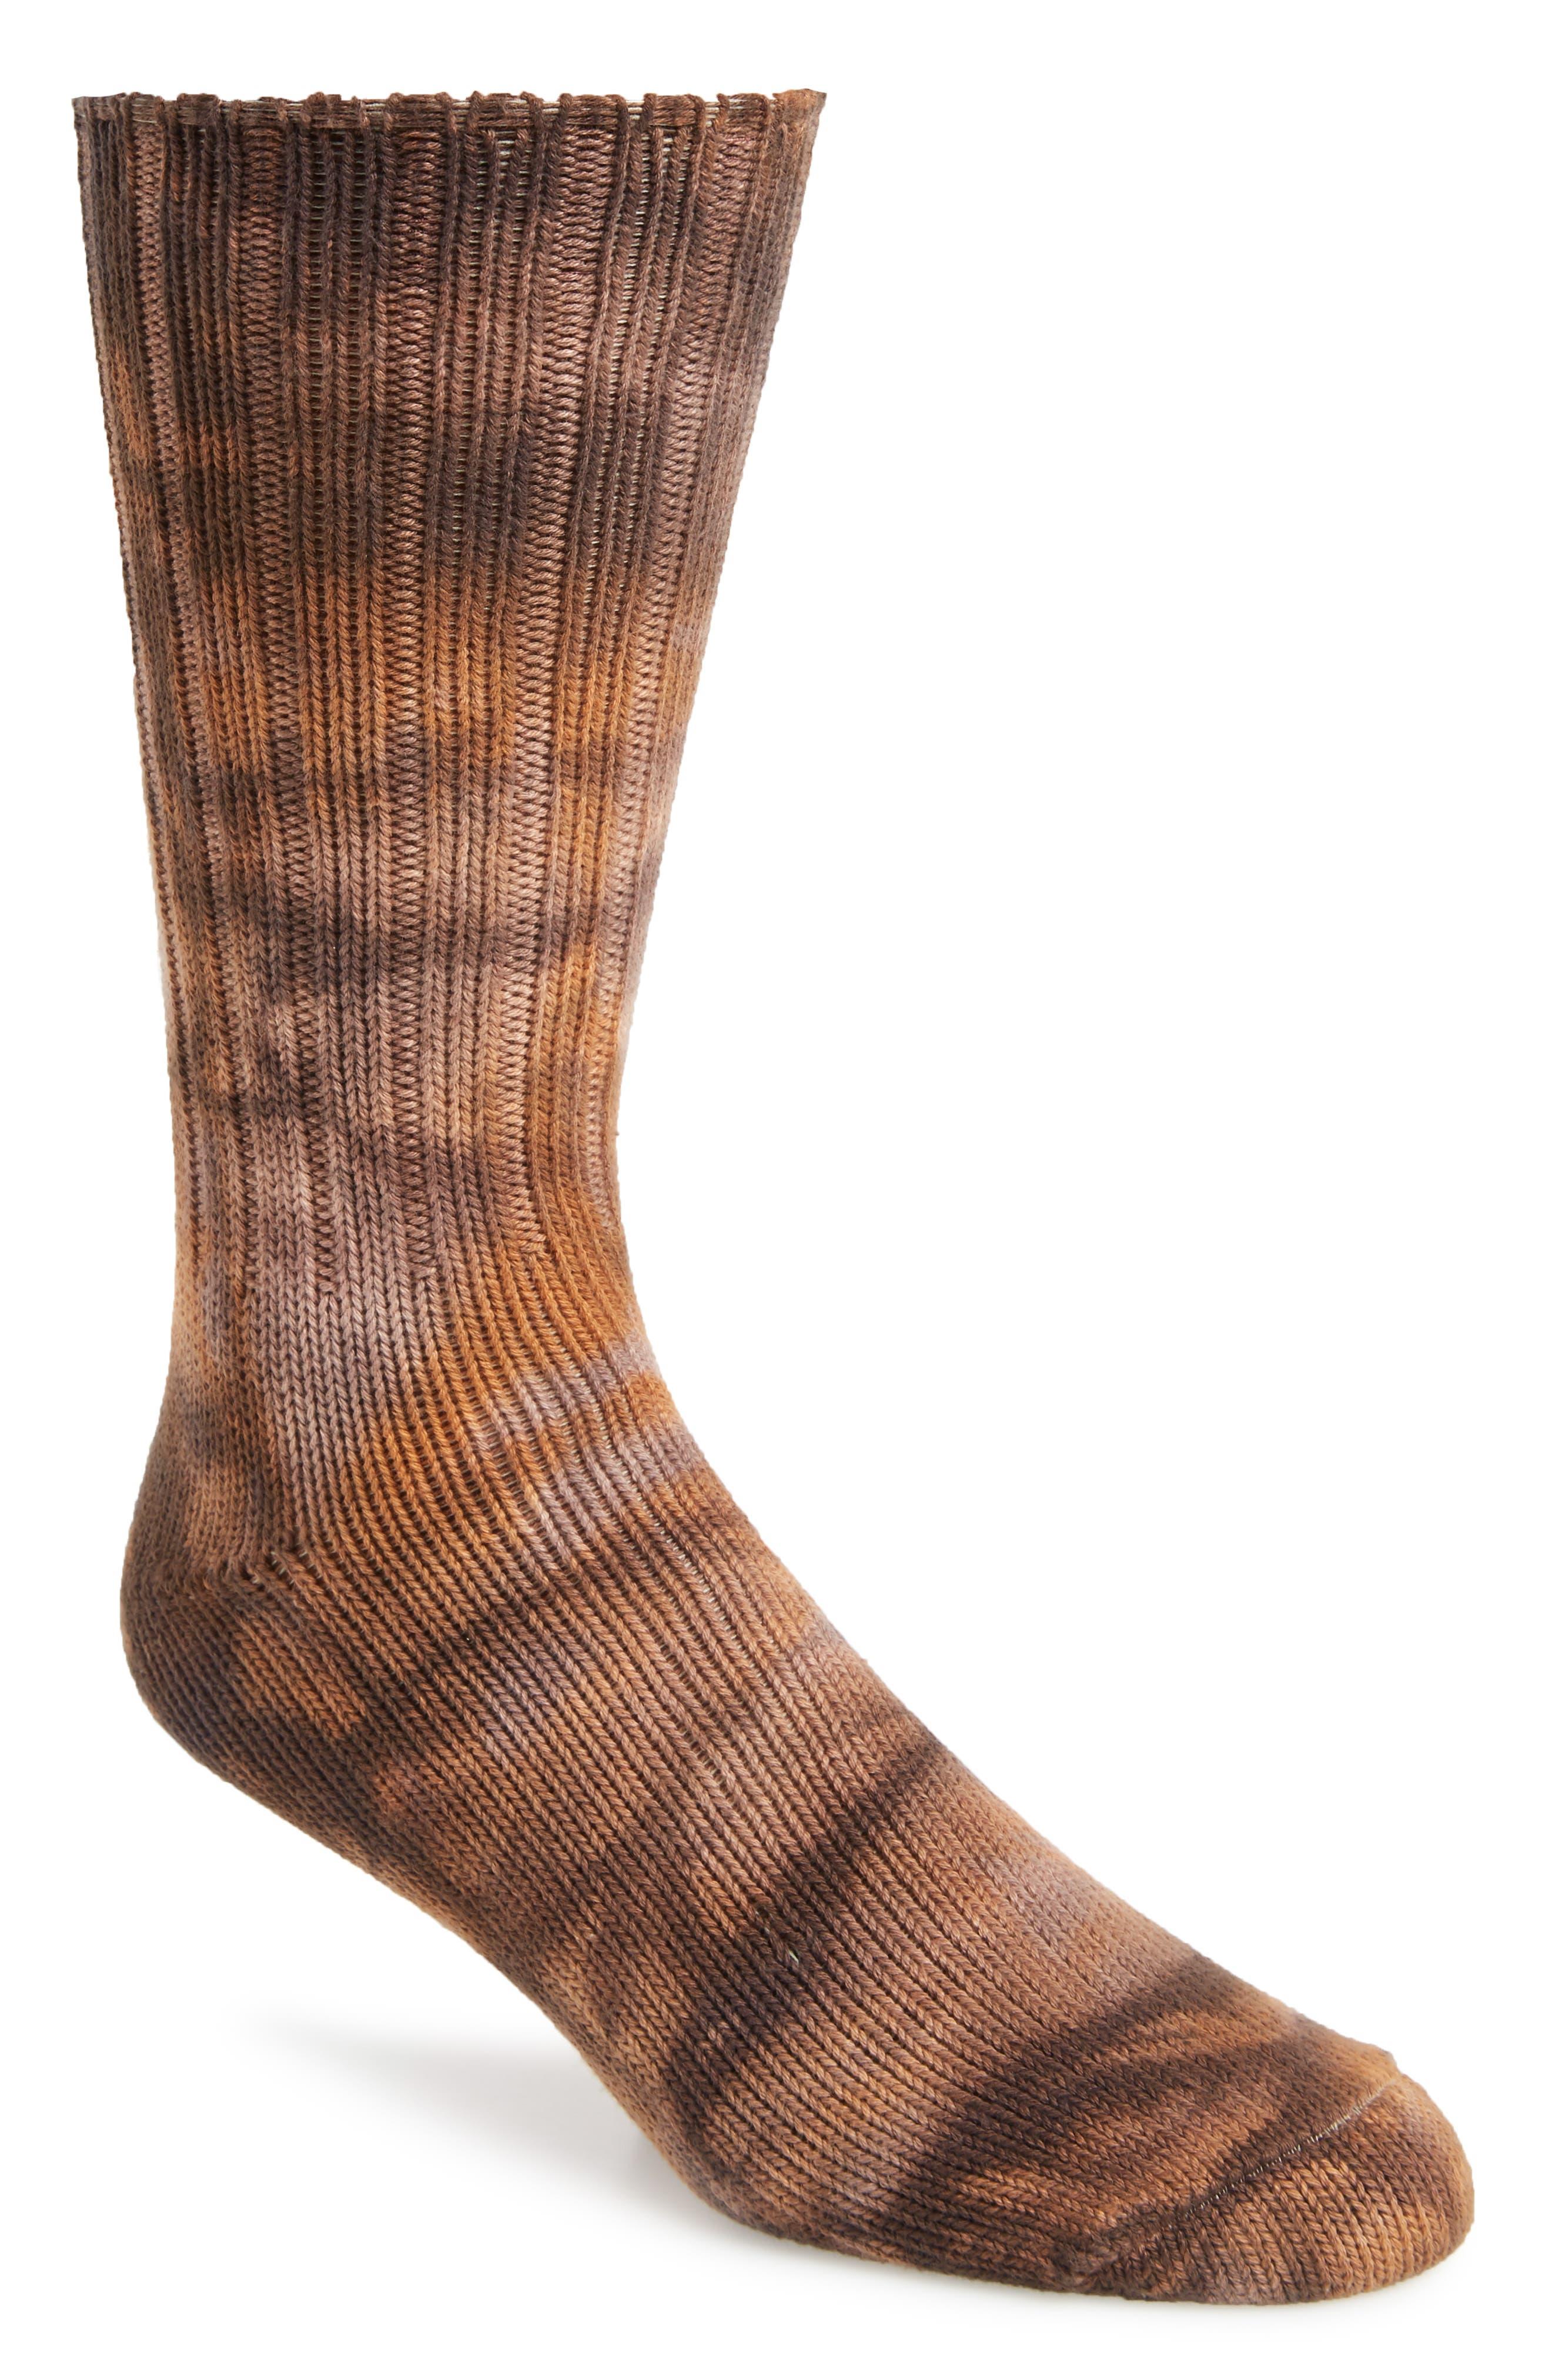 ANONYMOUS ISM, Uneven Dye Socks, Main thumbnail 1, color, BROWN